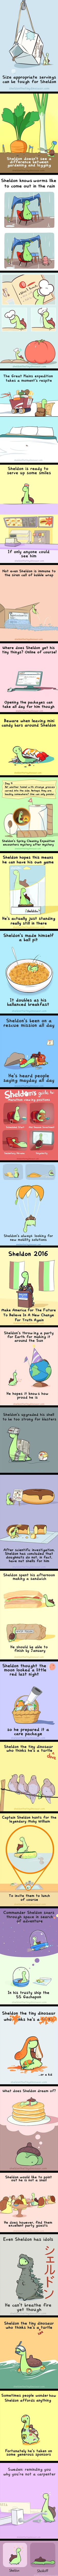 Sheldon The Tiny Dinosaur Comics (By Panaran Art)